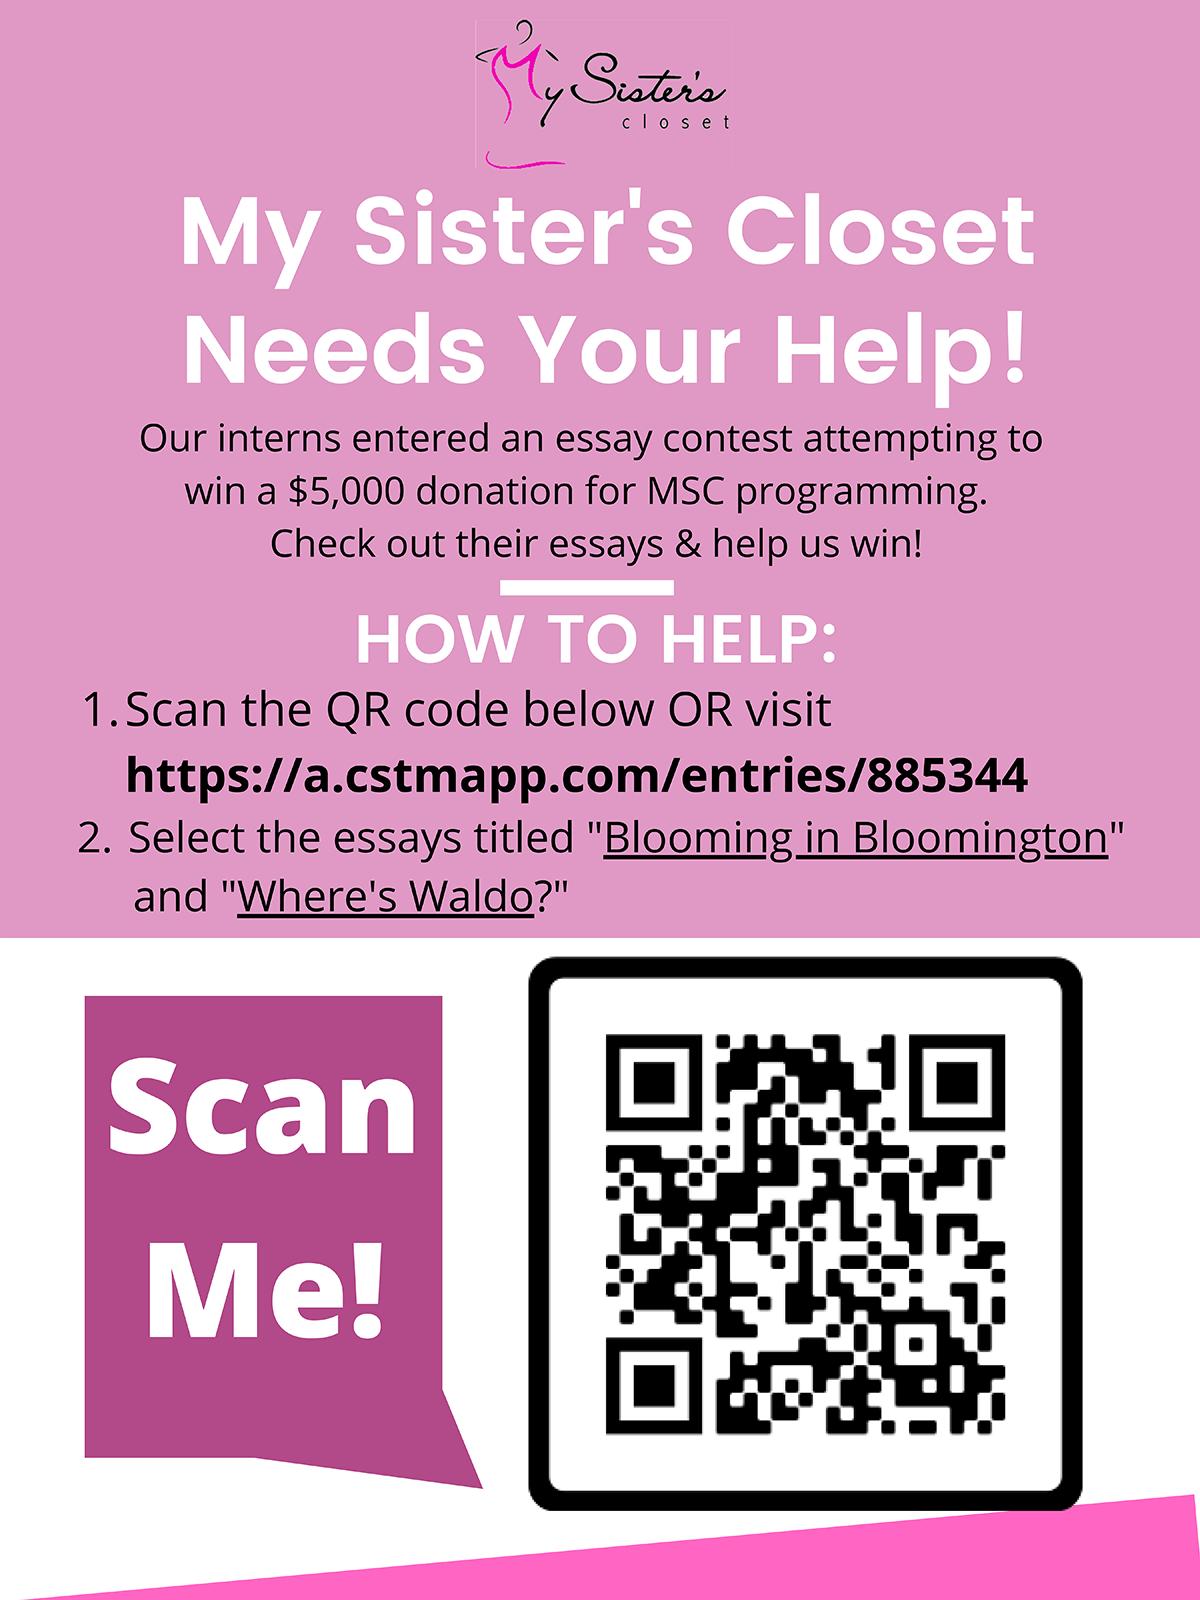 My Sister's Closet Essay Contest Ad 2021